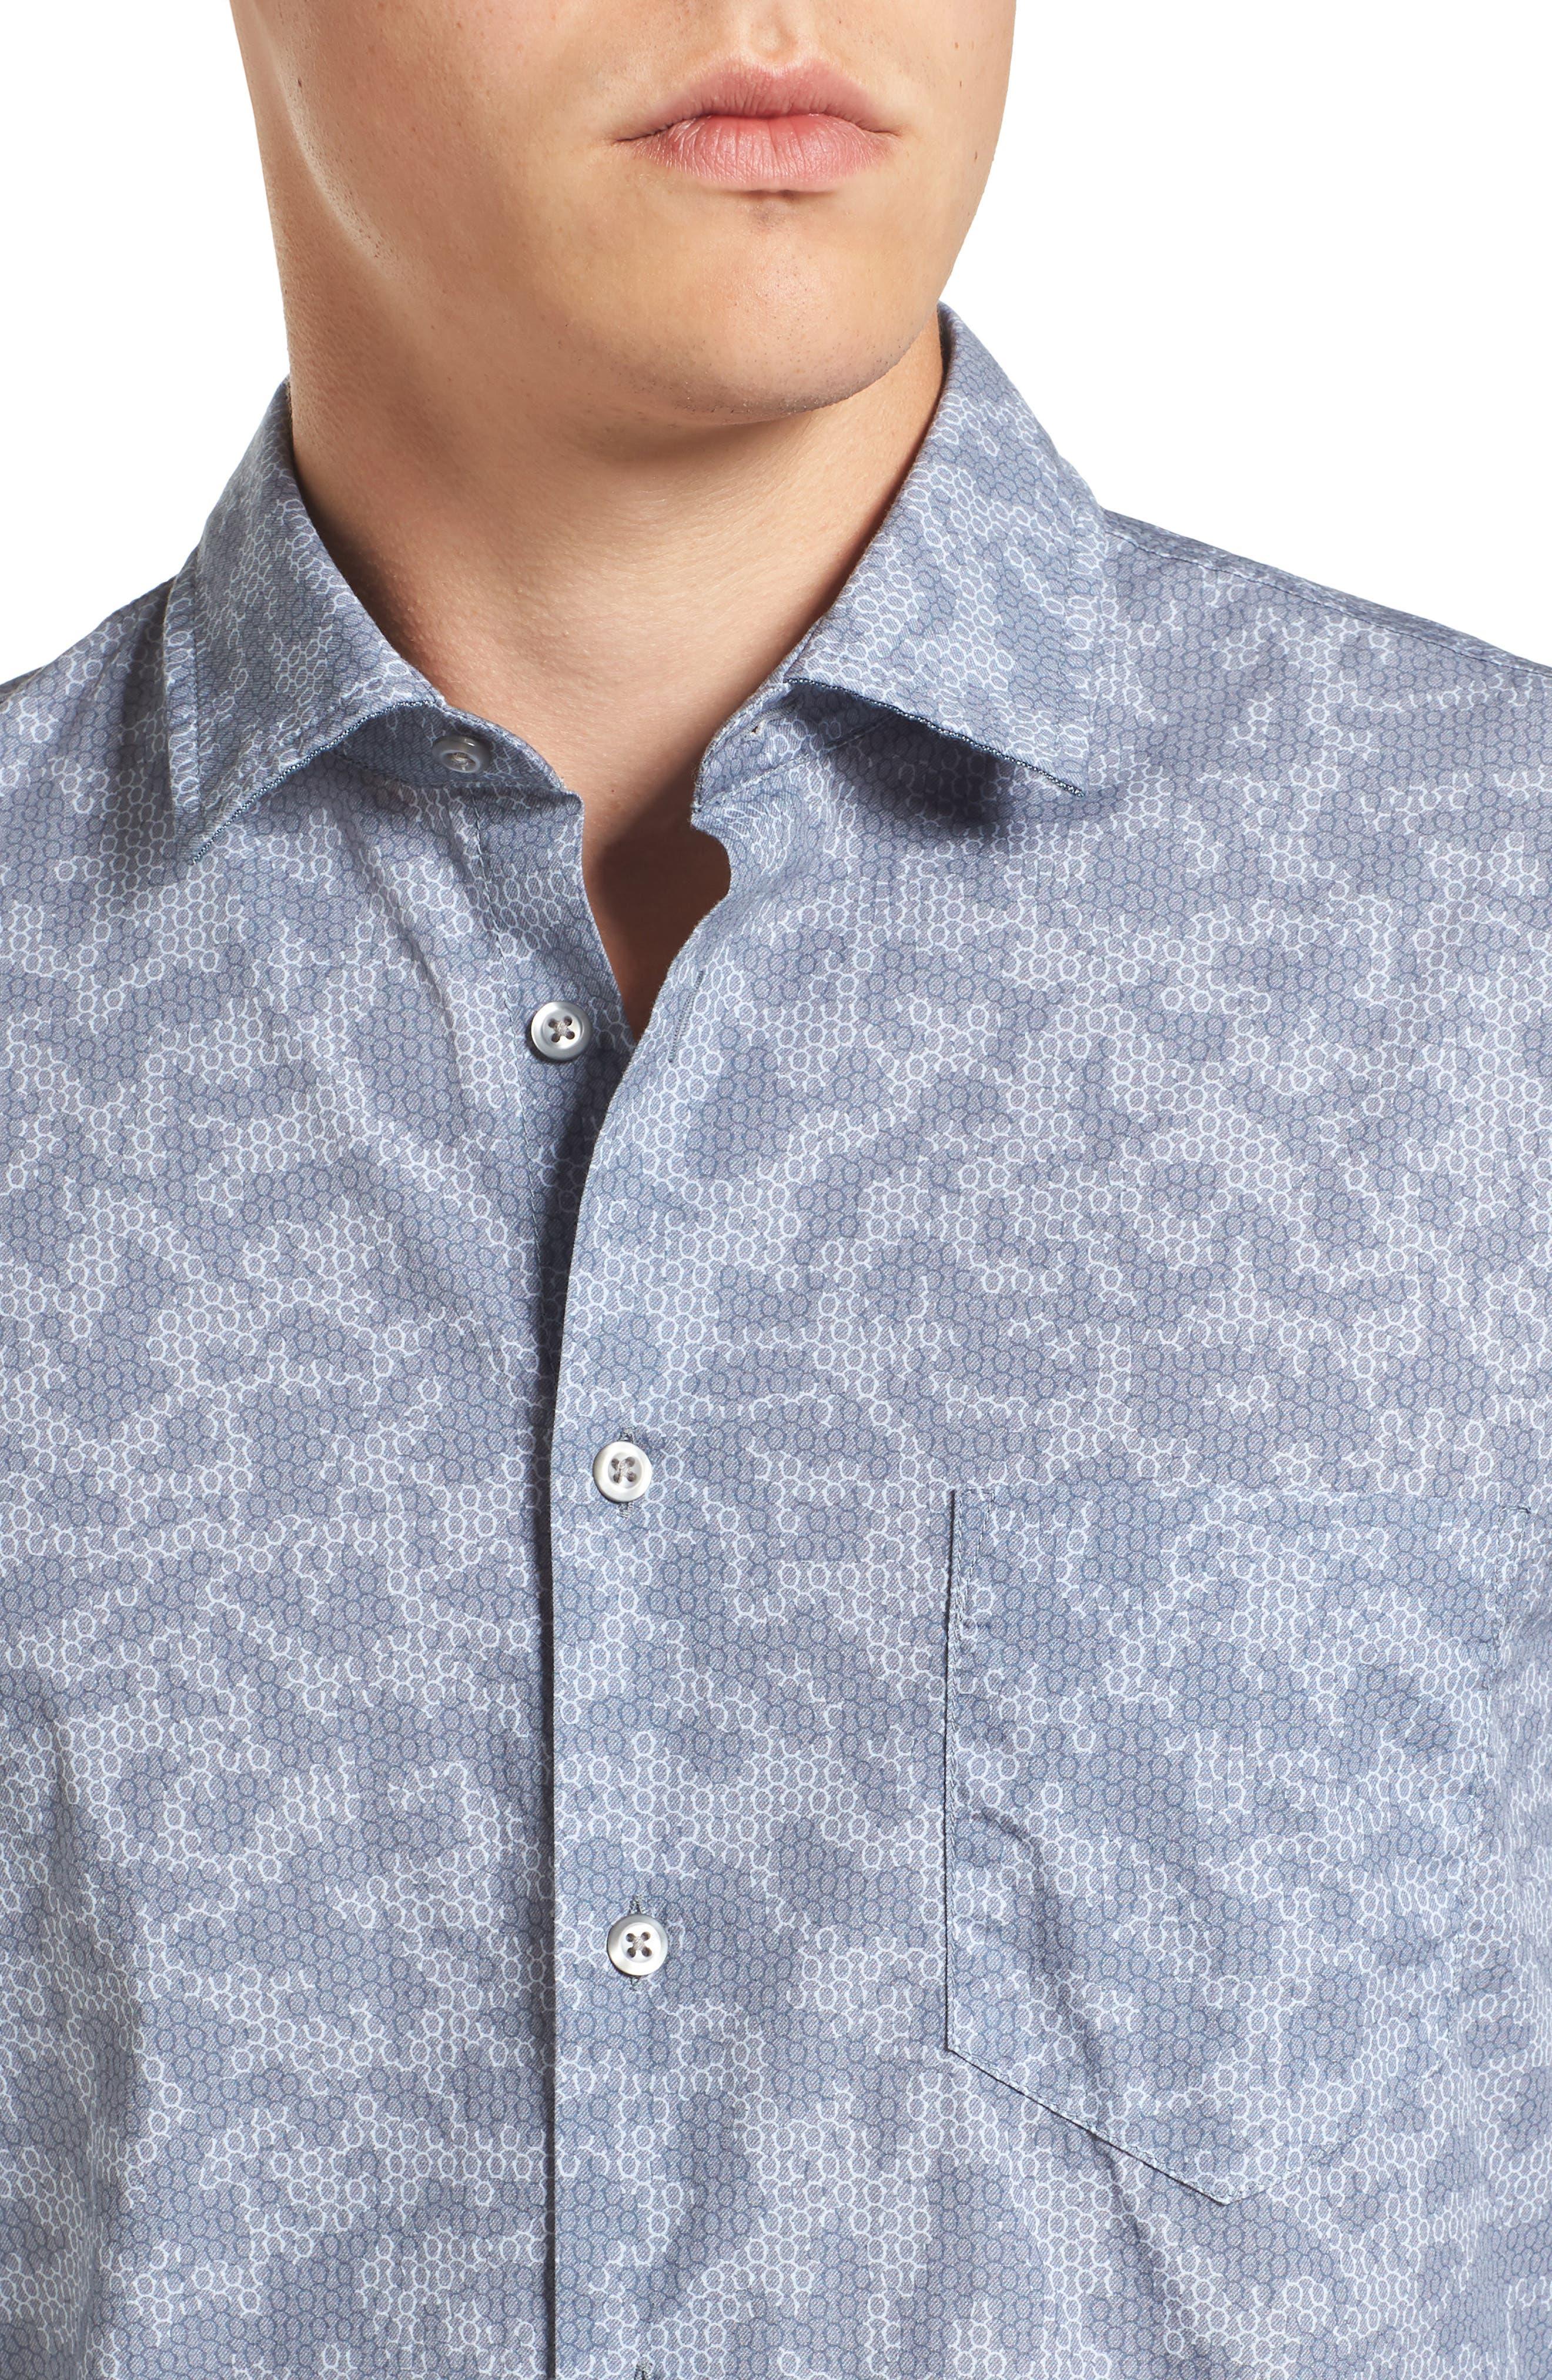 Alternate Image 4  - BOSS Orange Print Woven Shirt